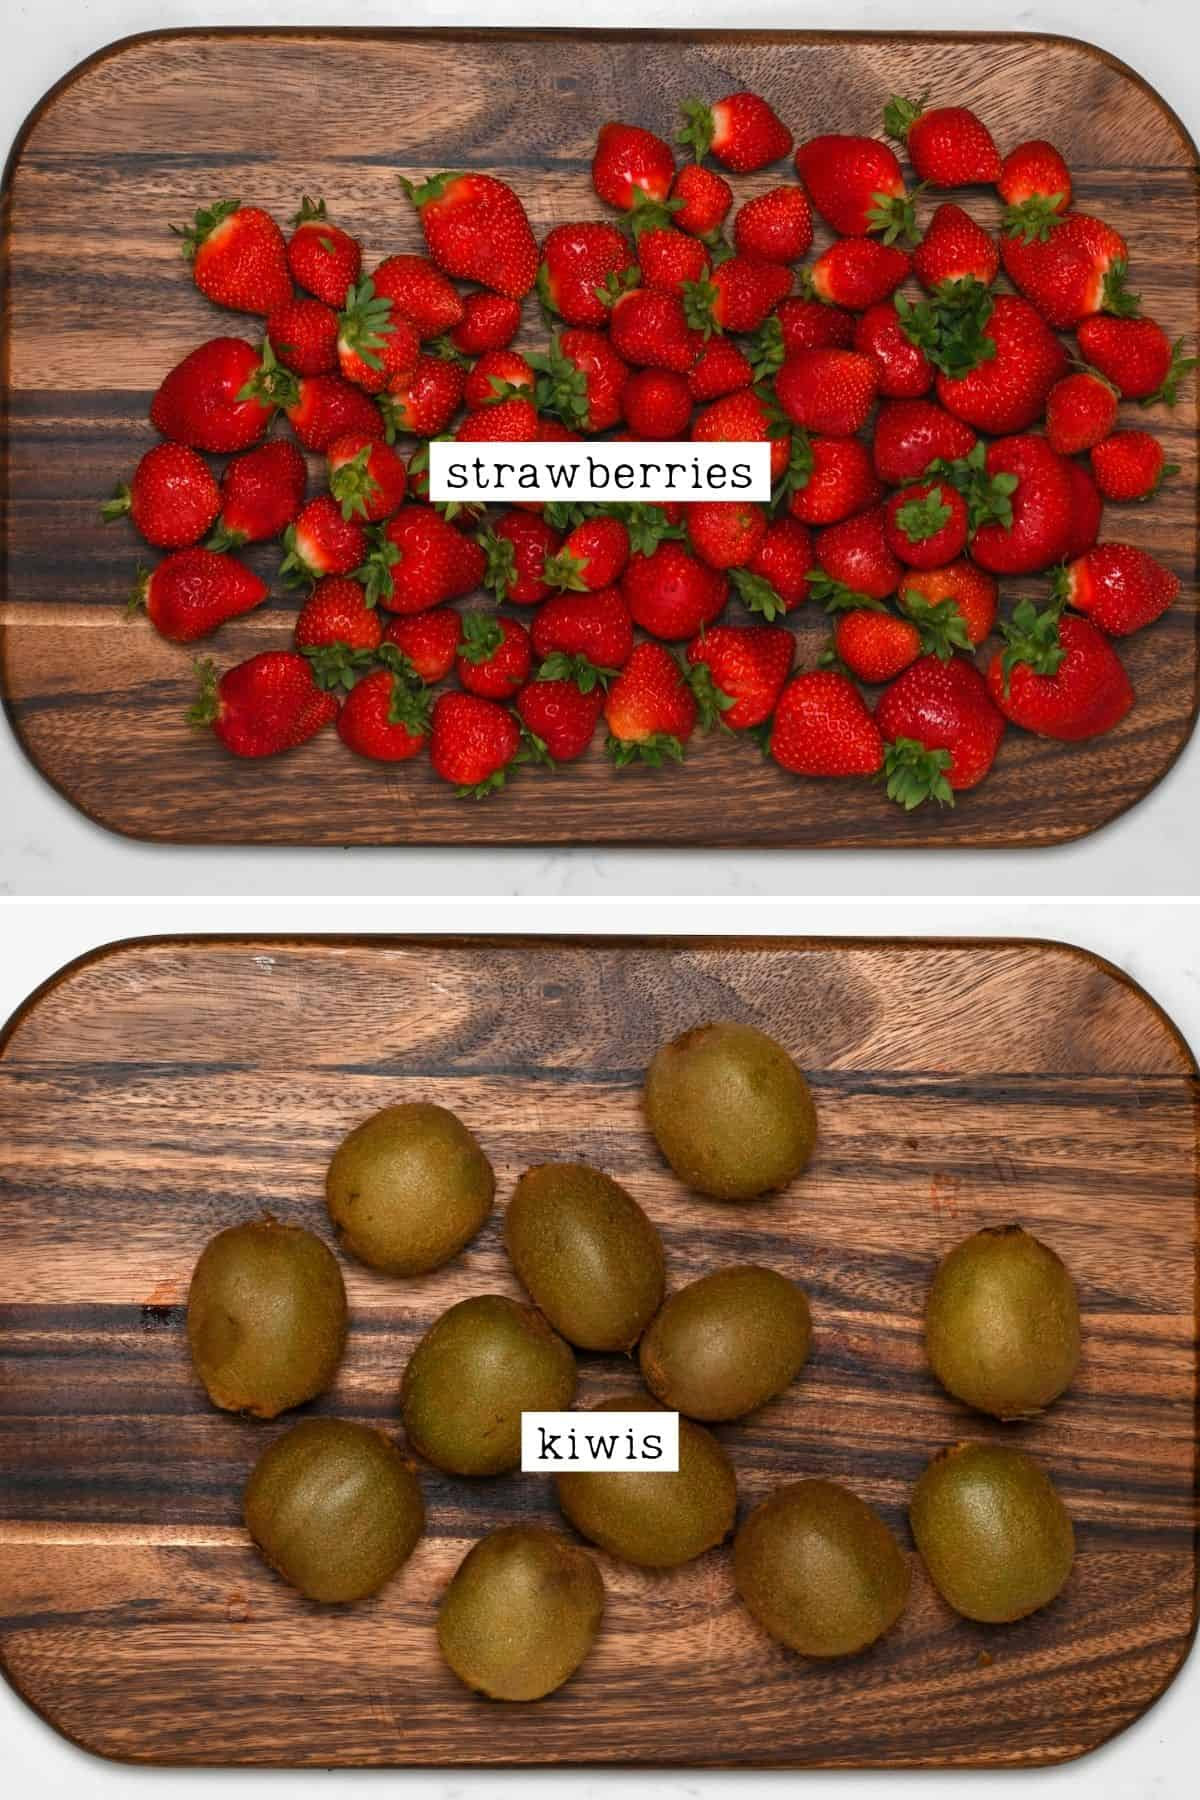 Strawberries and kiwis